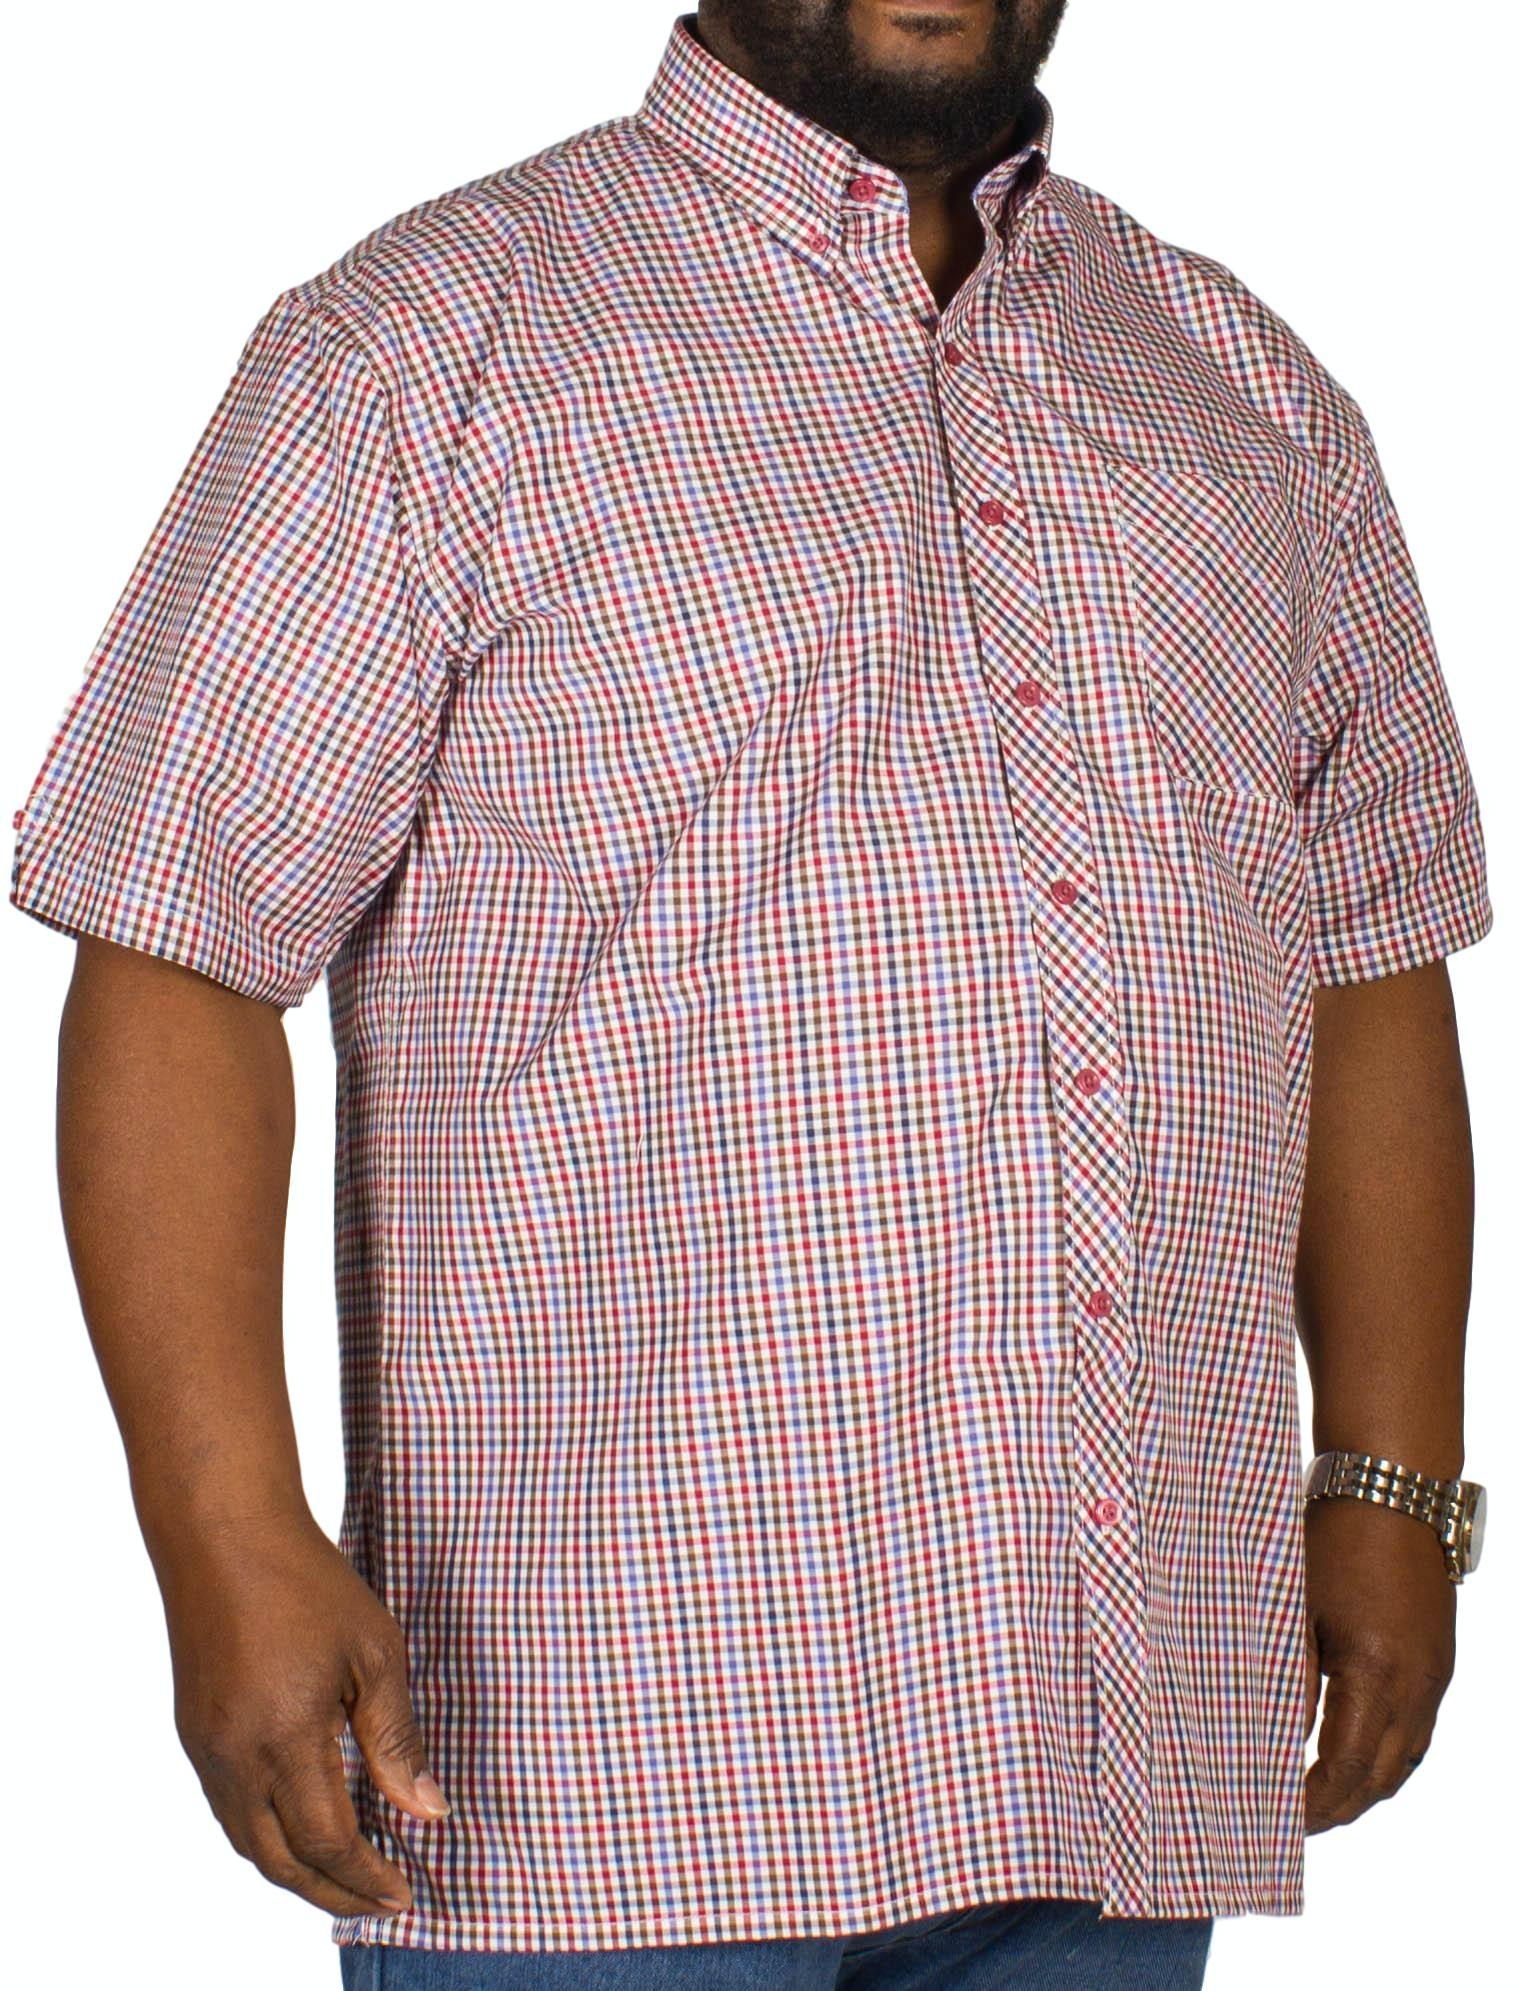 Espionage Gingham Check Short Sleeve Shirt Navy/Red/Tan